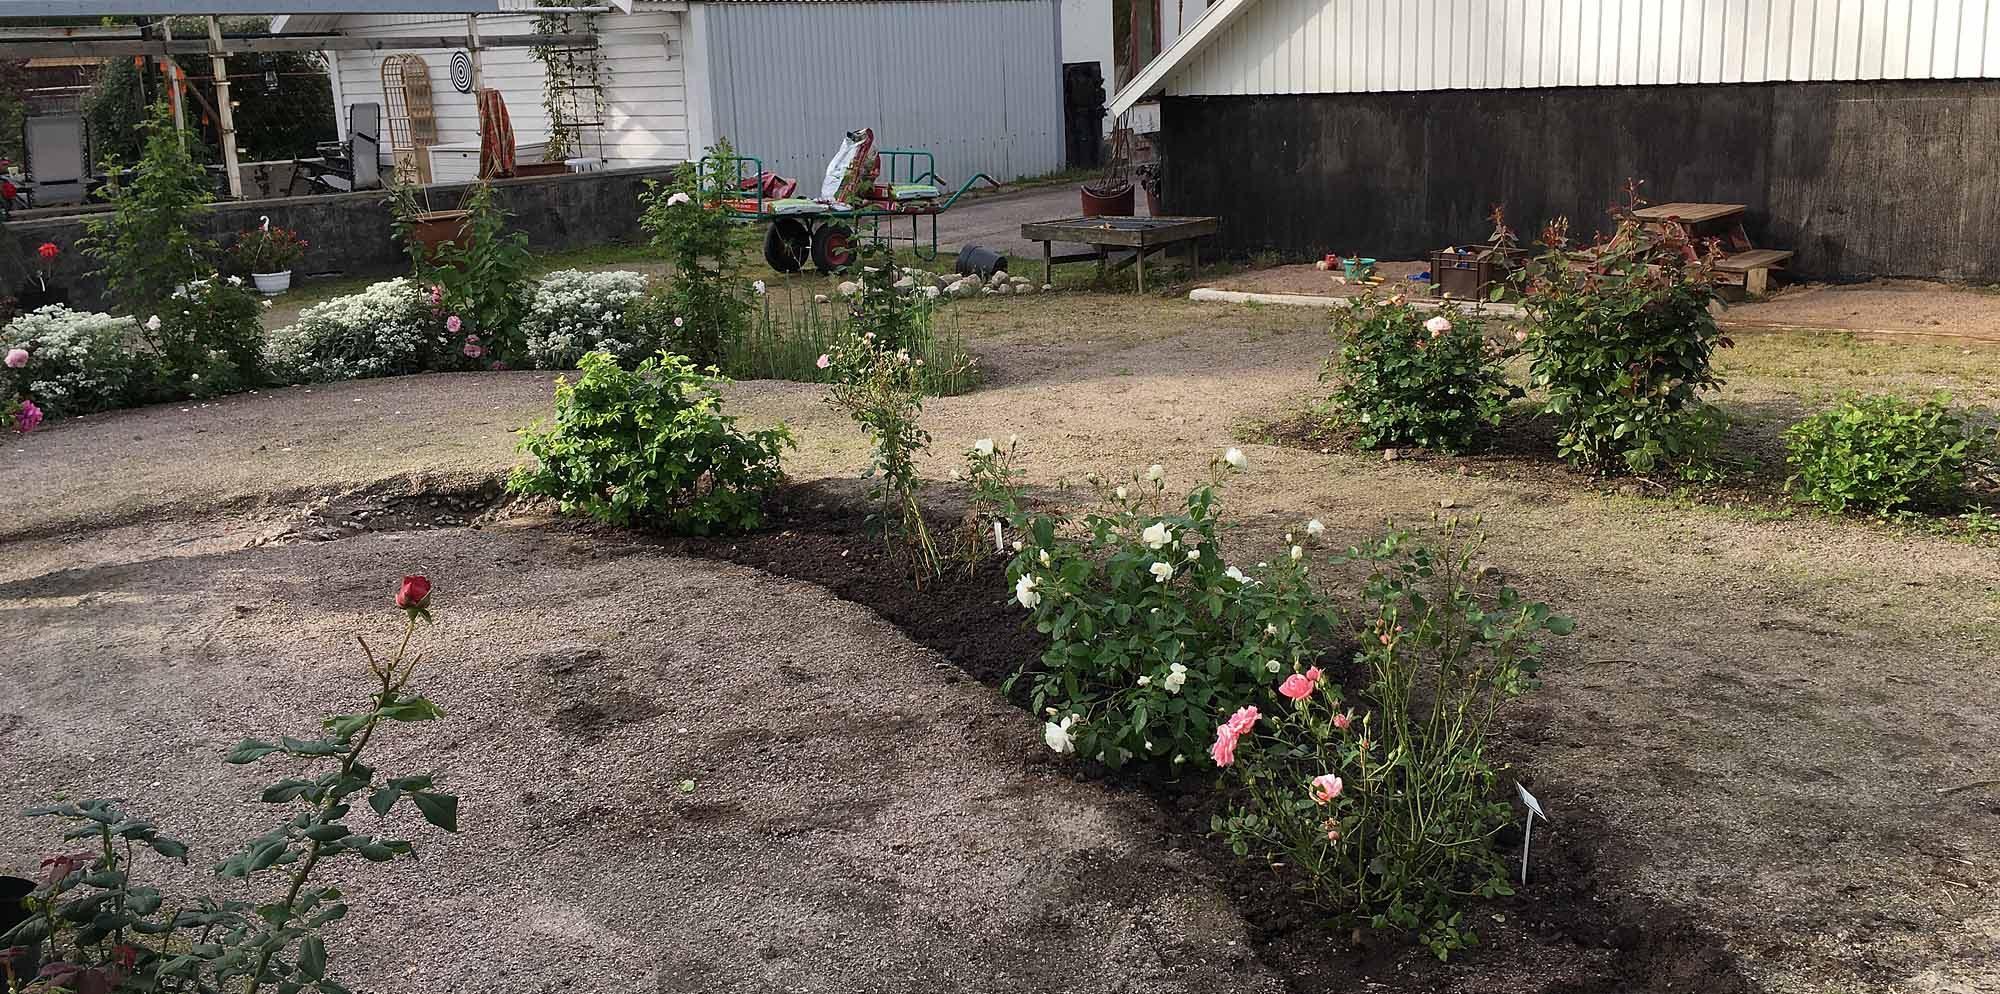 Plantering rosor